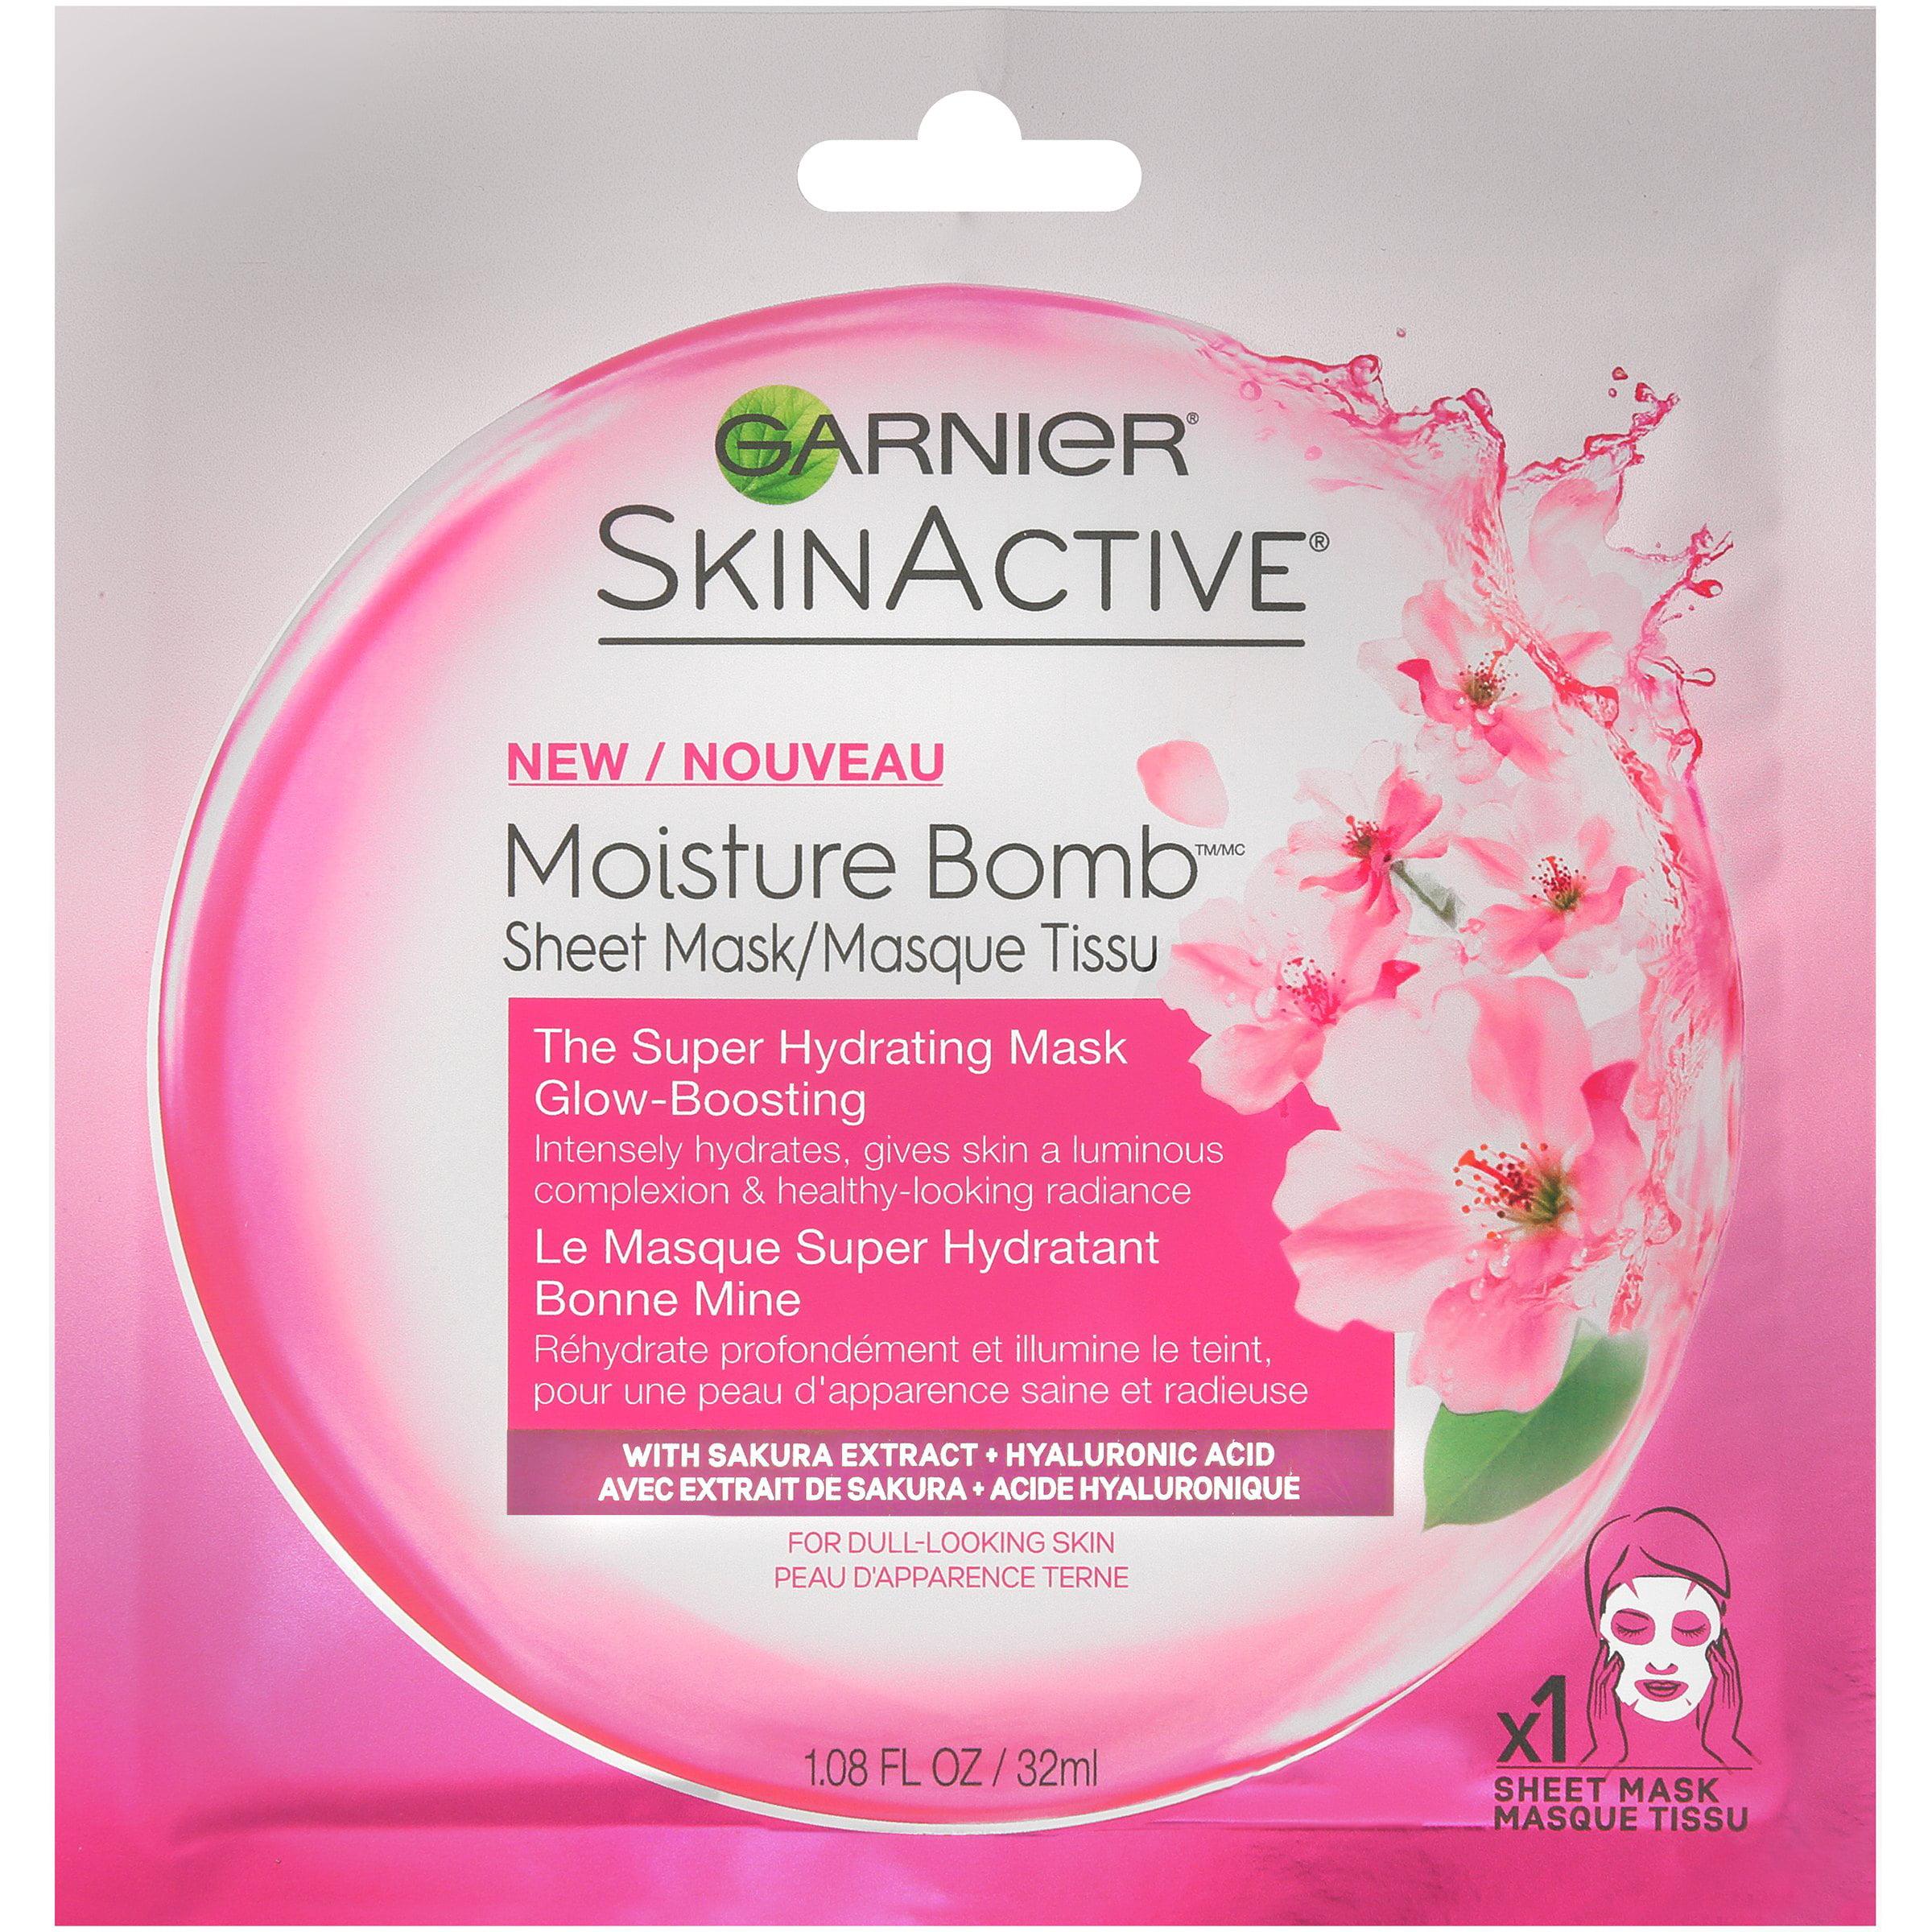 Garnier SkinActive Moisture Bomb The Super Hydrating Glow-Boosting Sheet Mask 1.08 fl. oz. Pack